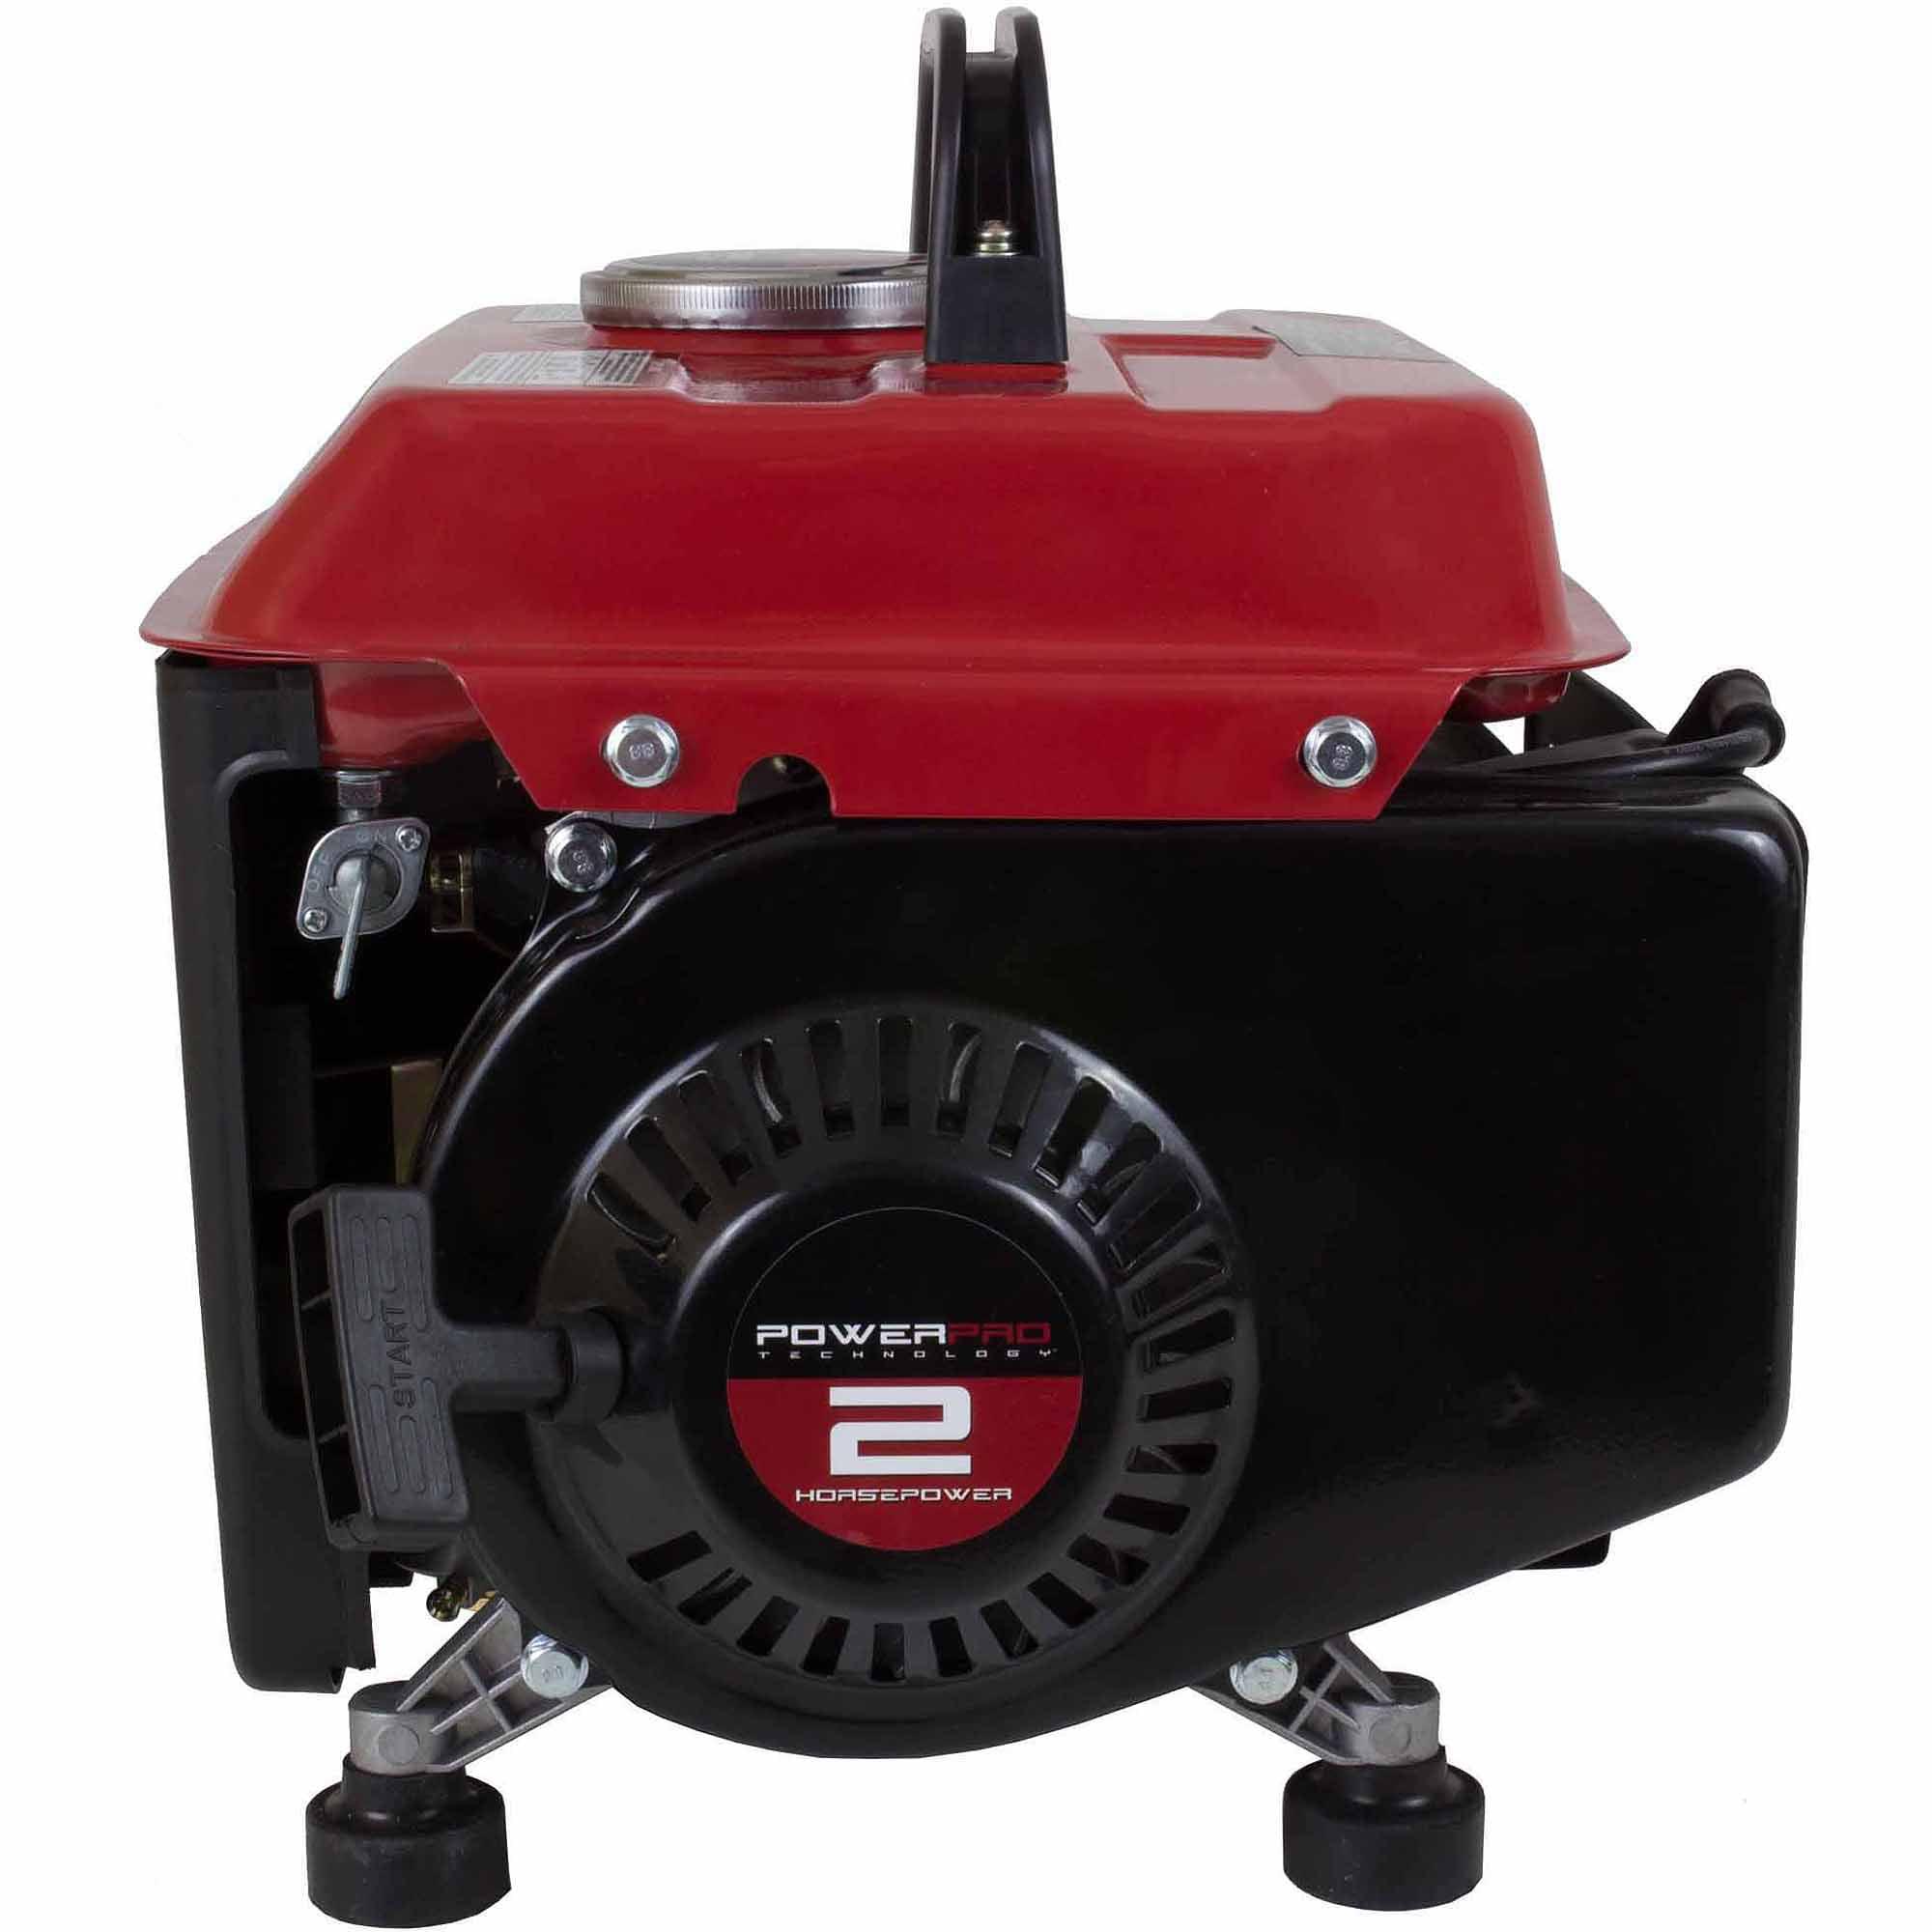 Powerpro 2 Stroke Generator 1000w Home Backup Power Recommendations Page